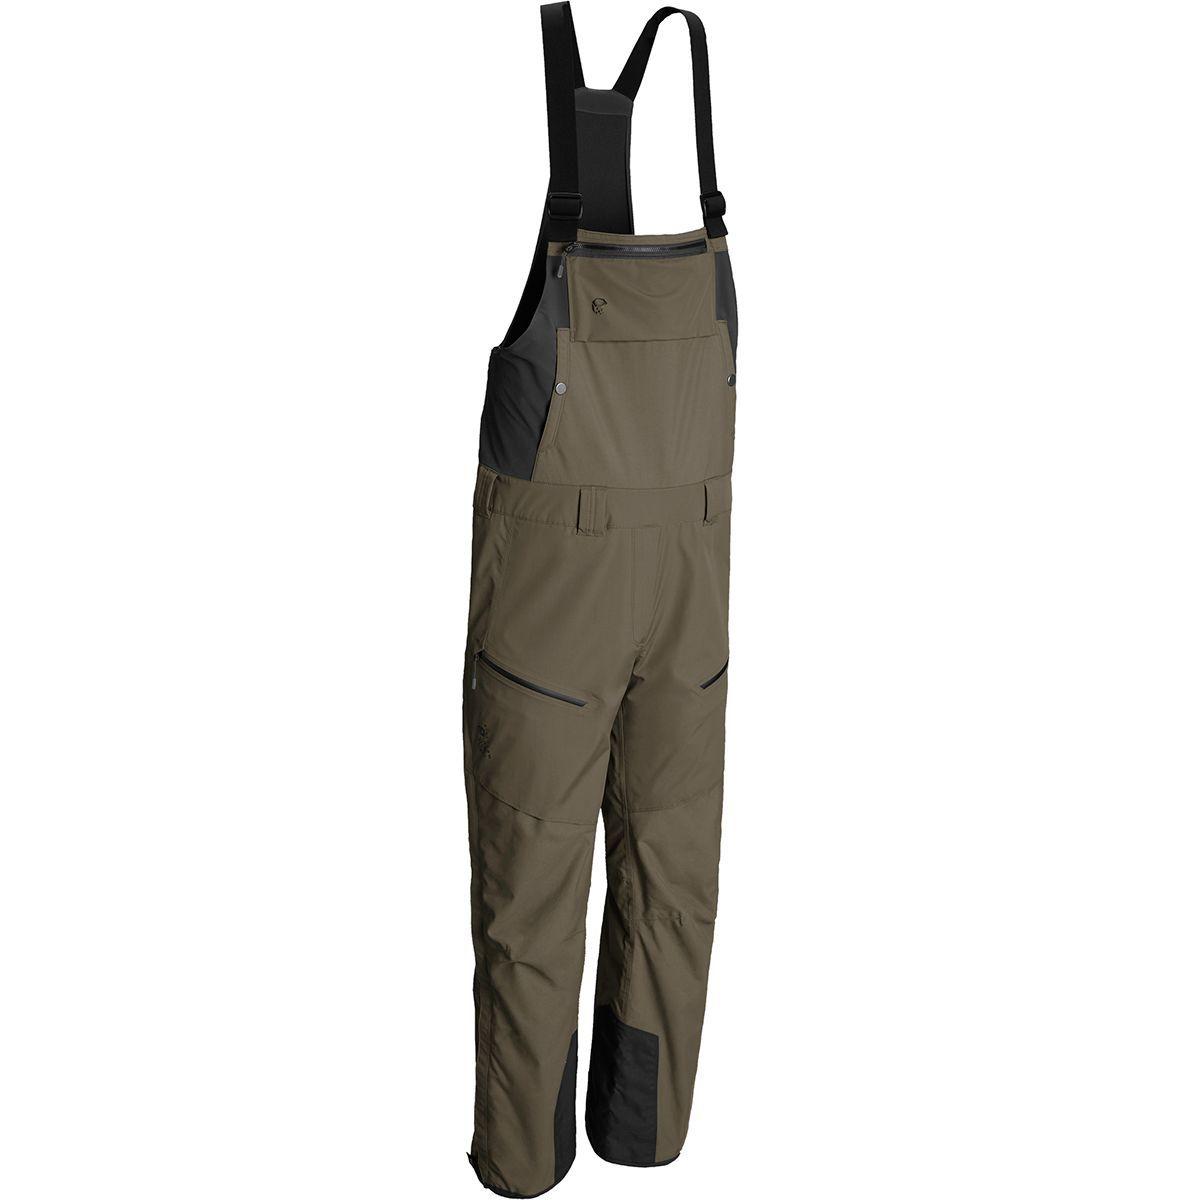 Mountain Hardwear Firefall Bib Pant - Men's